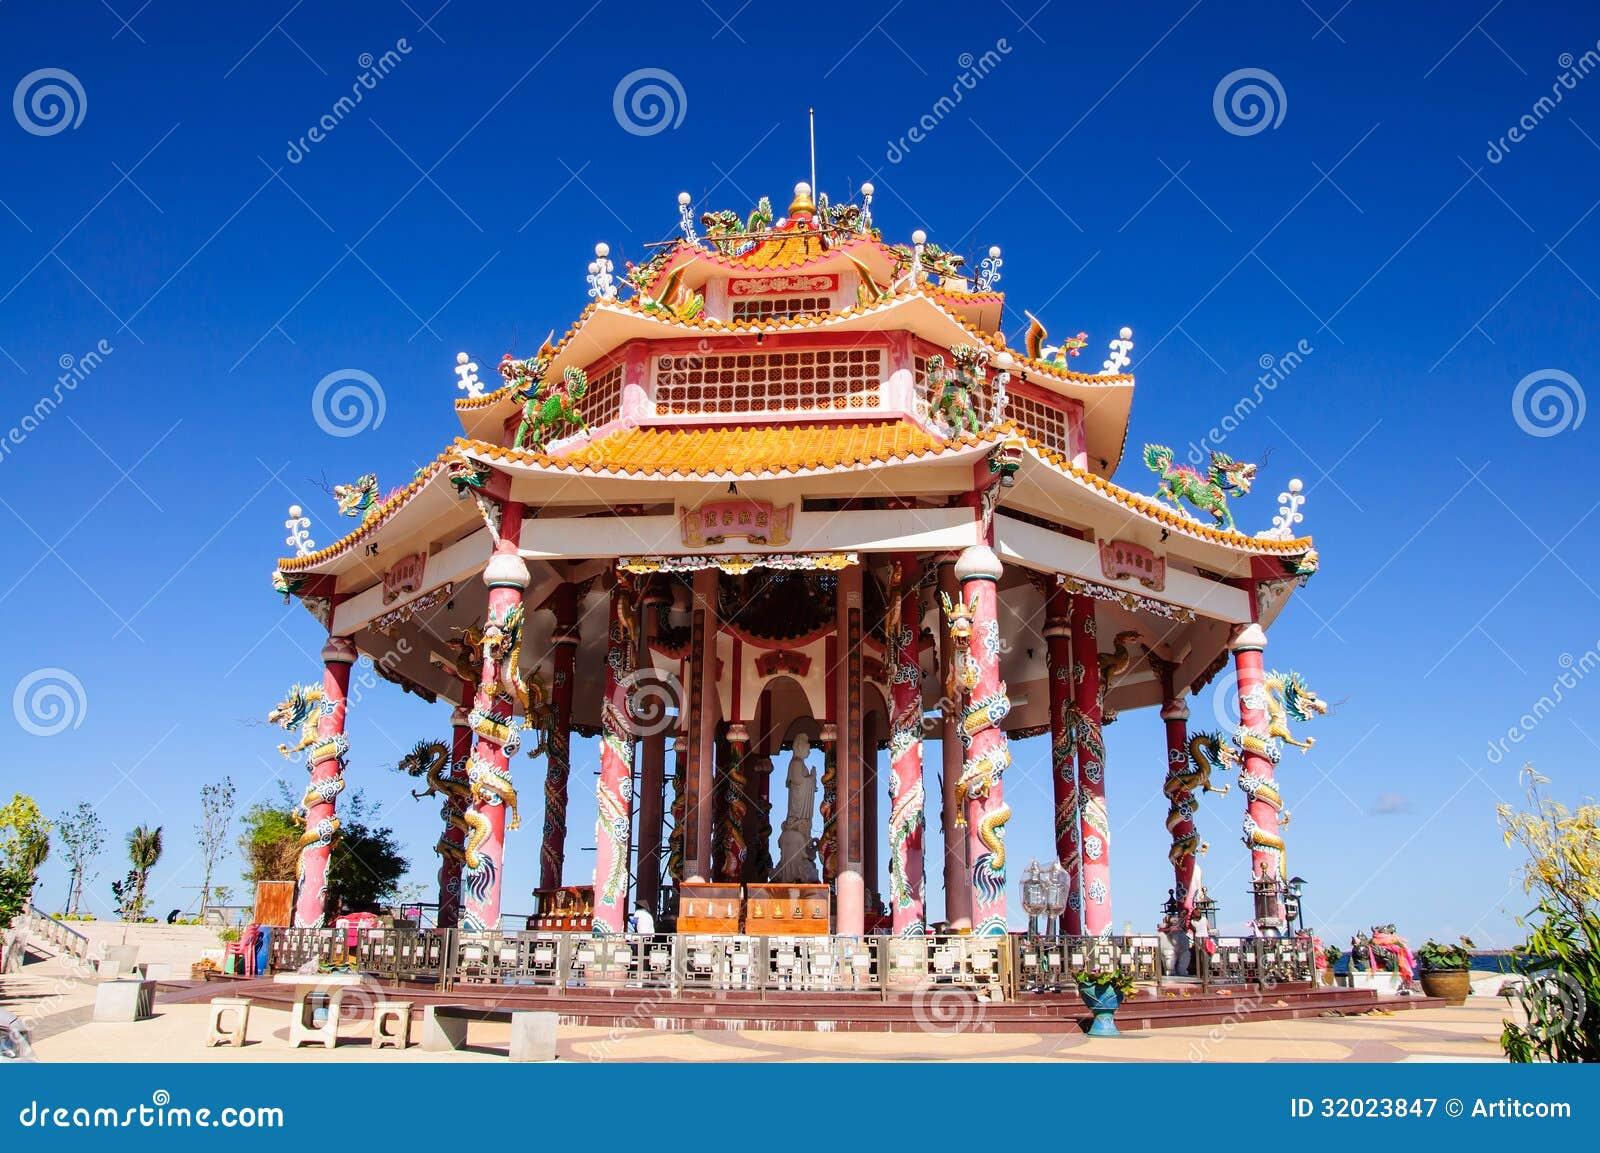 Temple chinois avec la statue de dragon image stock - Photo de dragon chinois ...